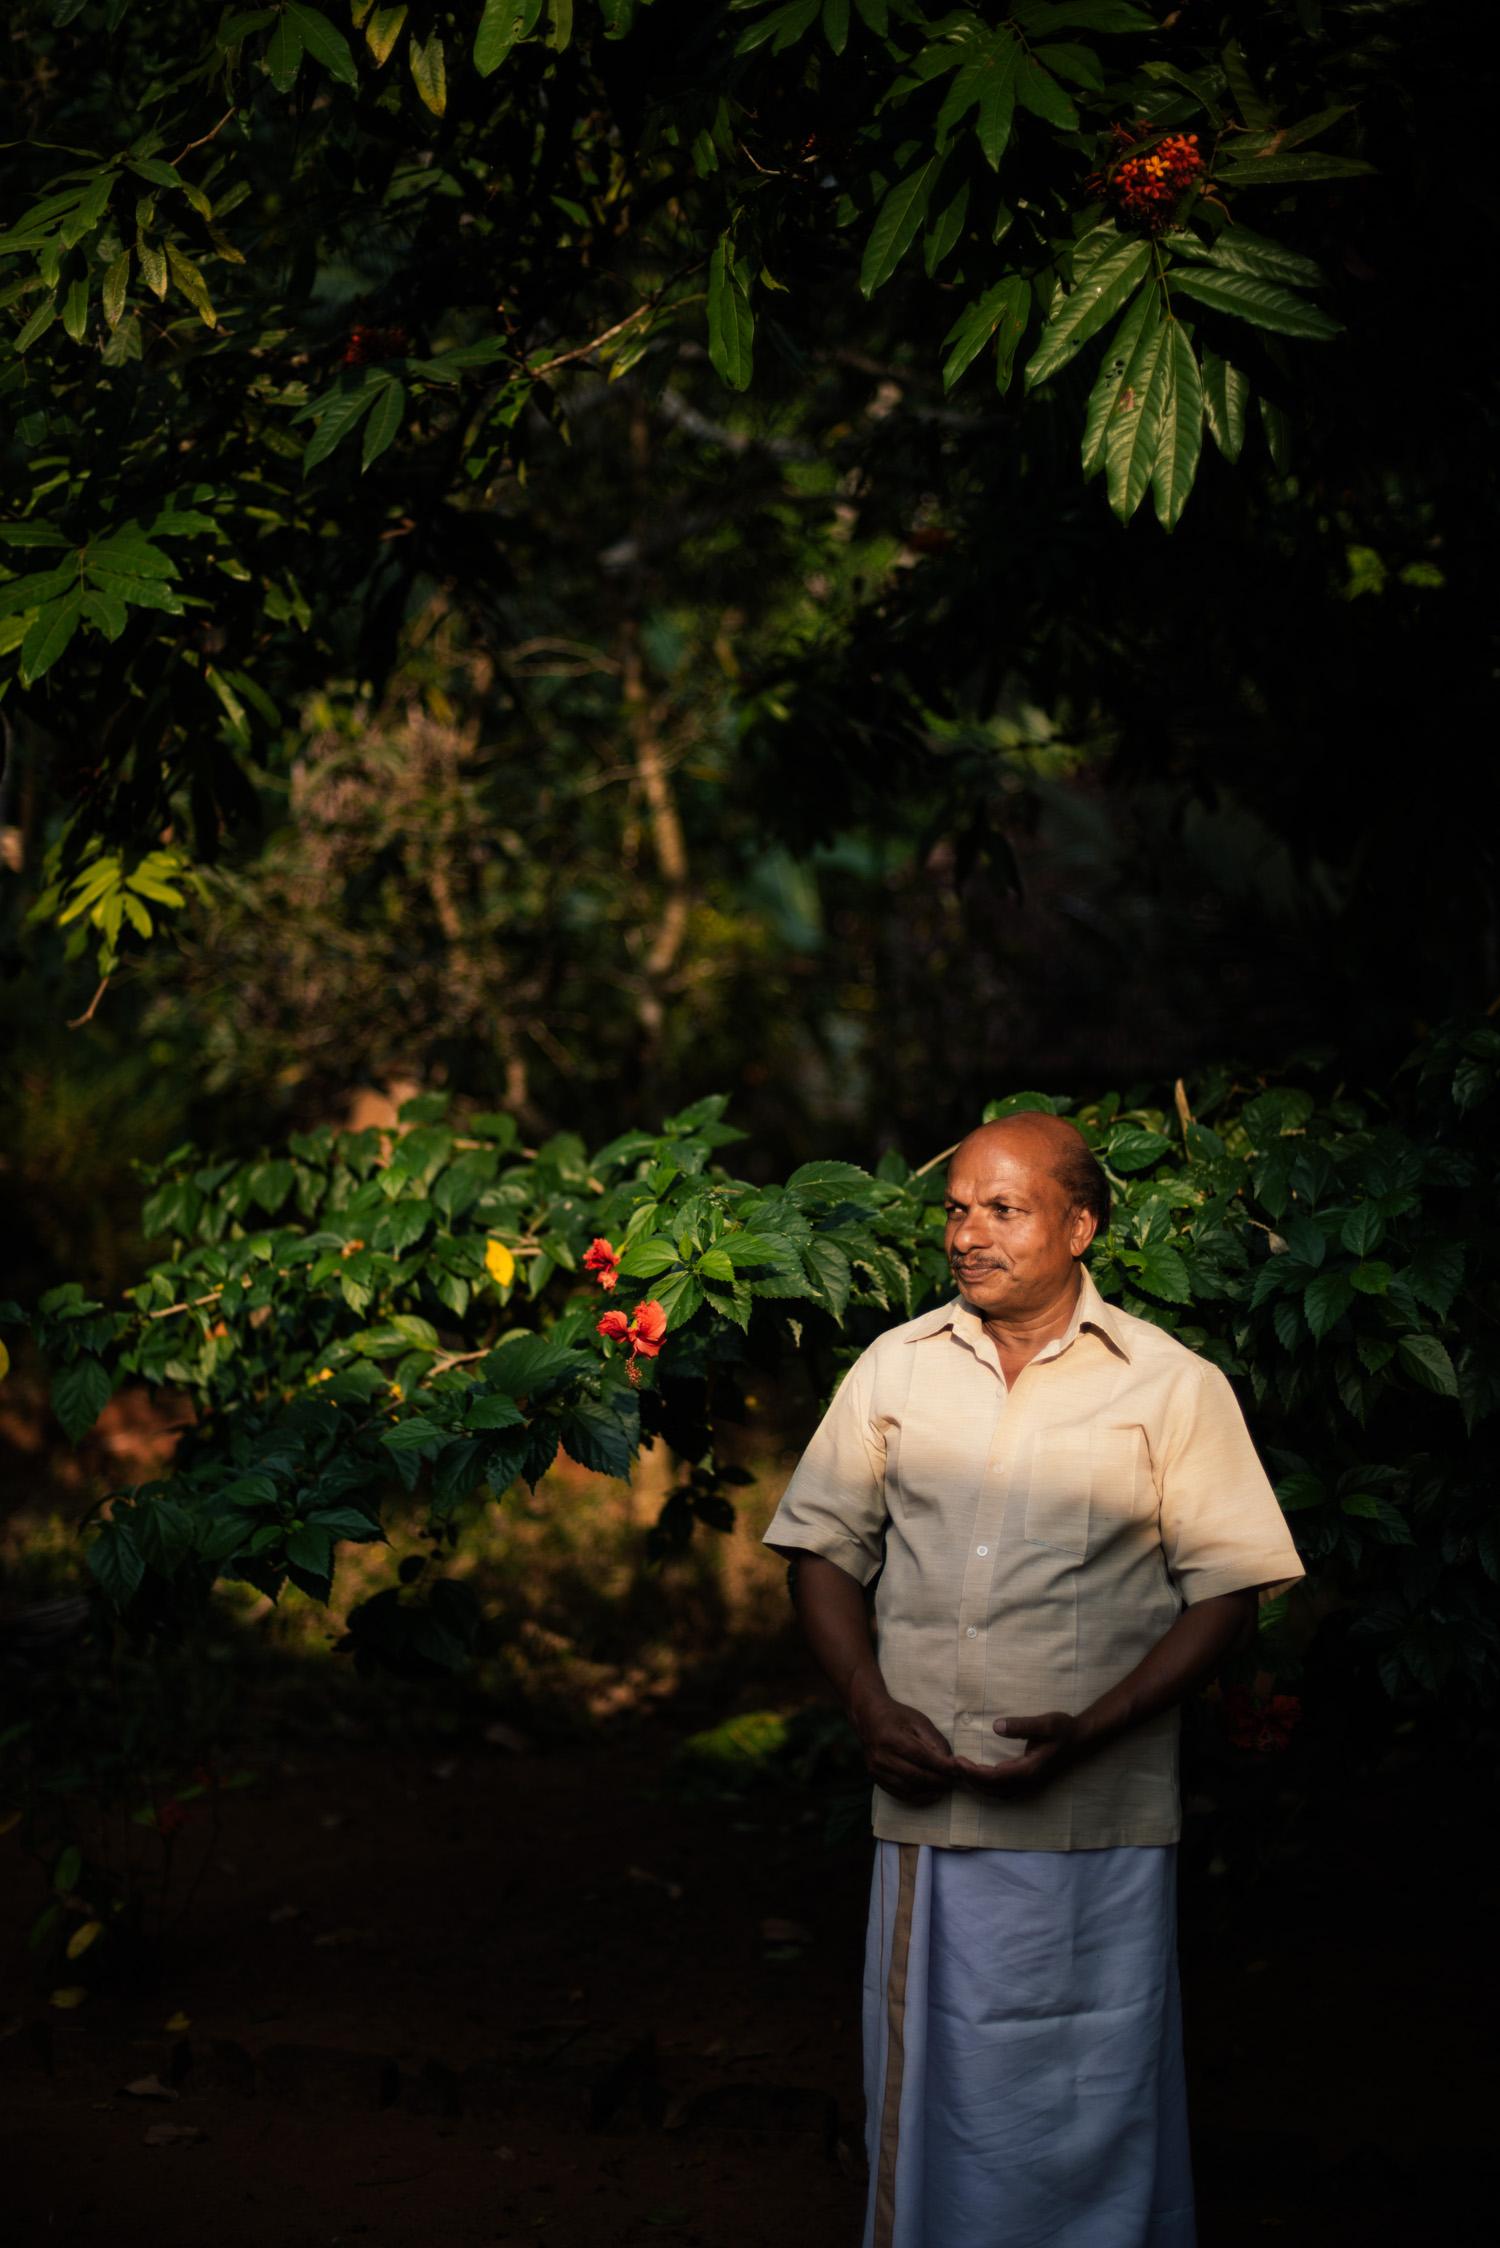 3_Chhandak Pradhan-portrait-singles-editorial.jpg